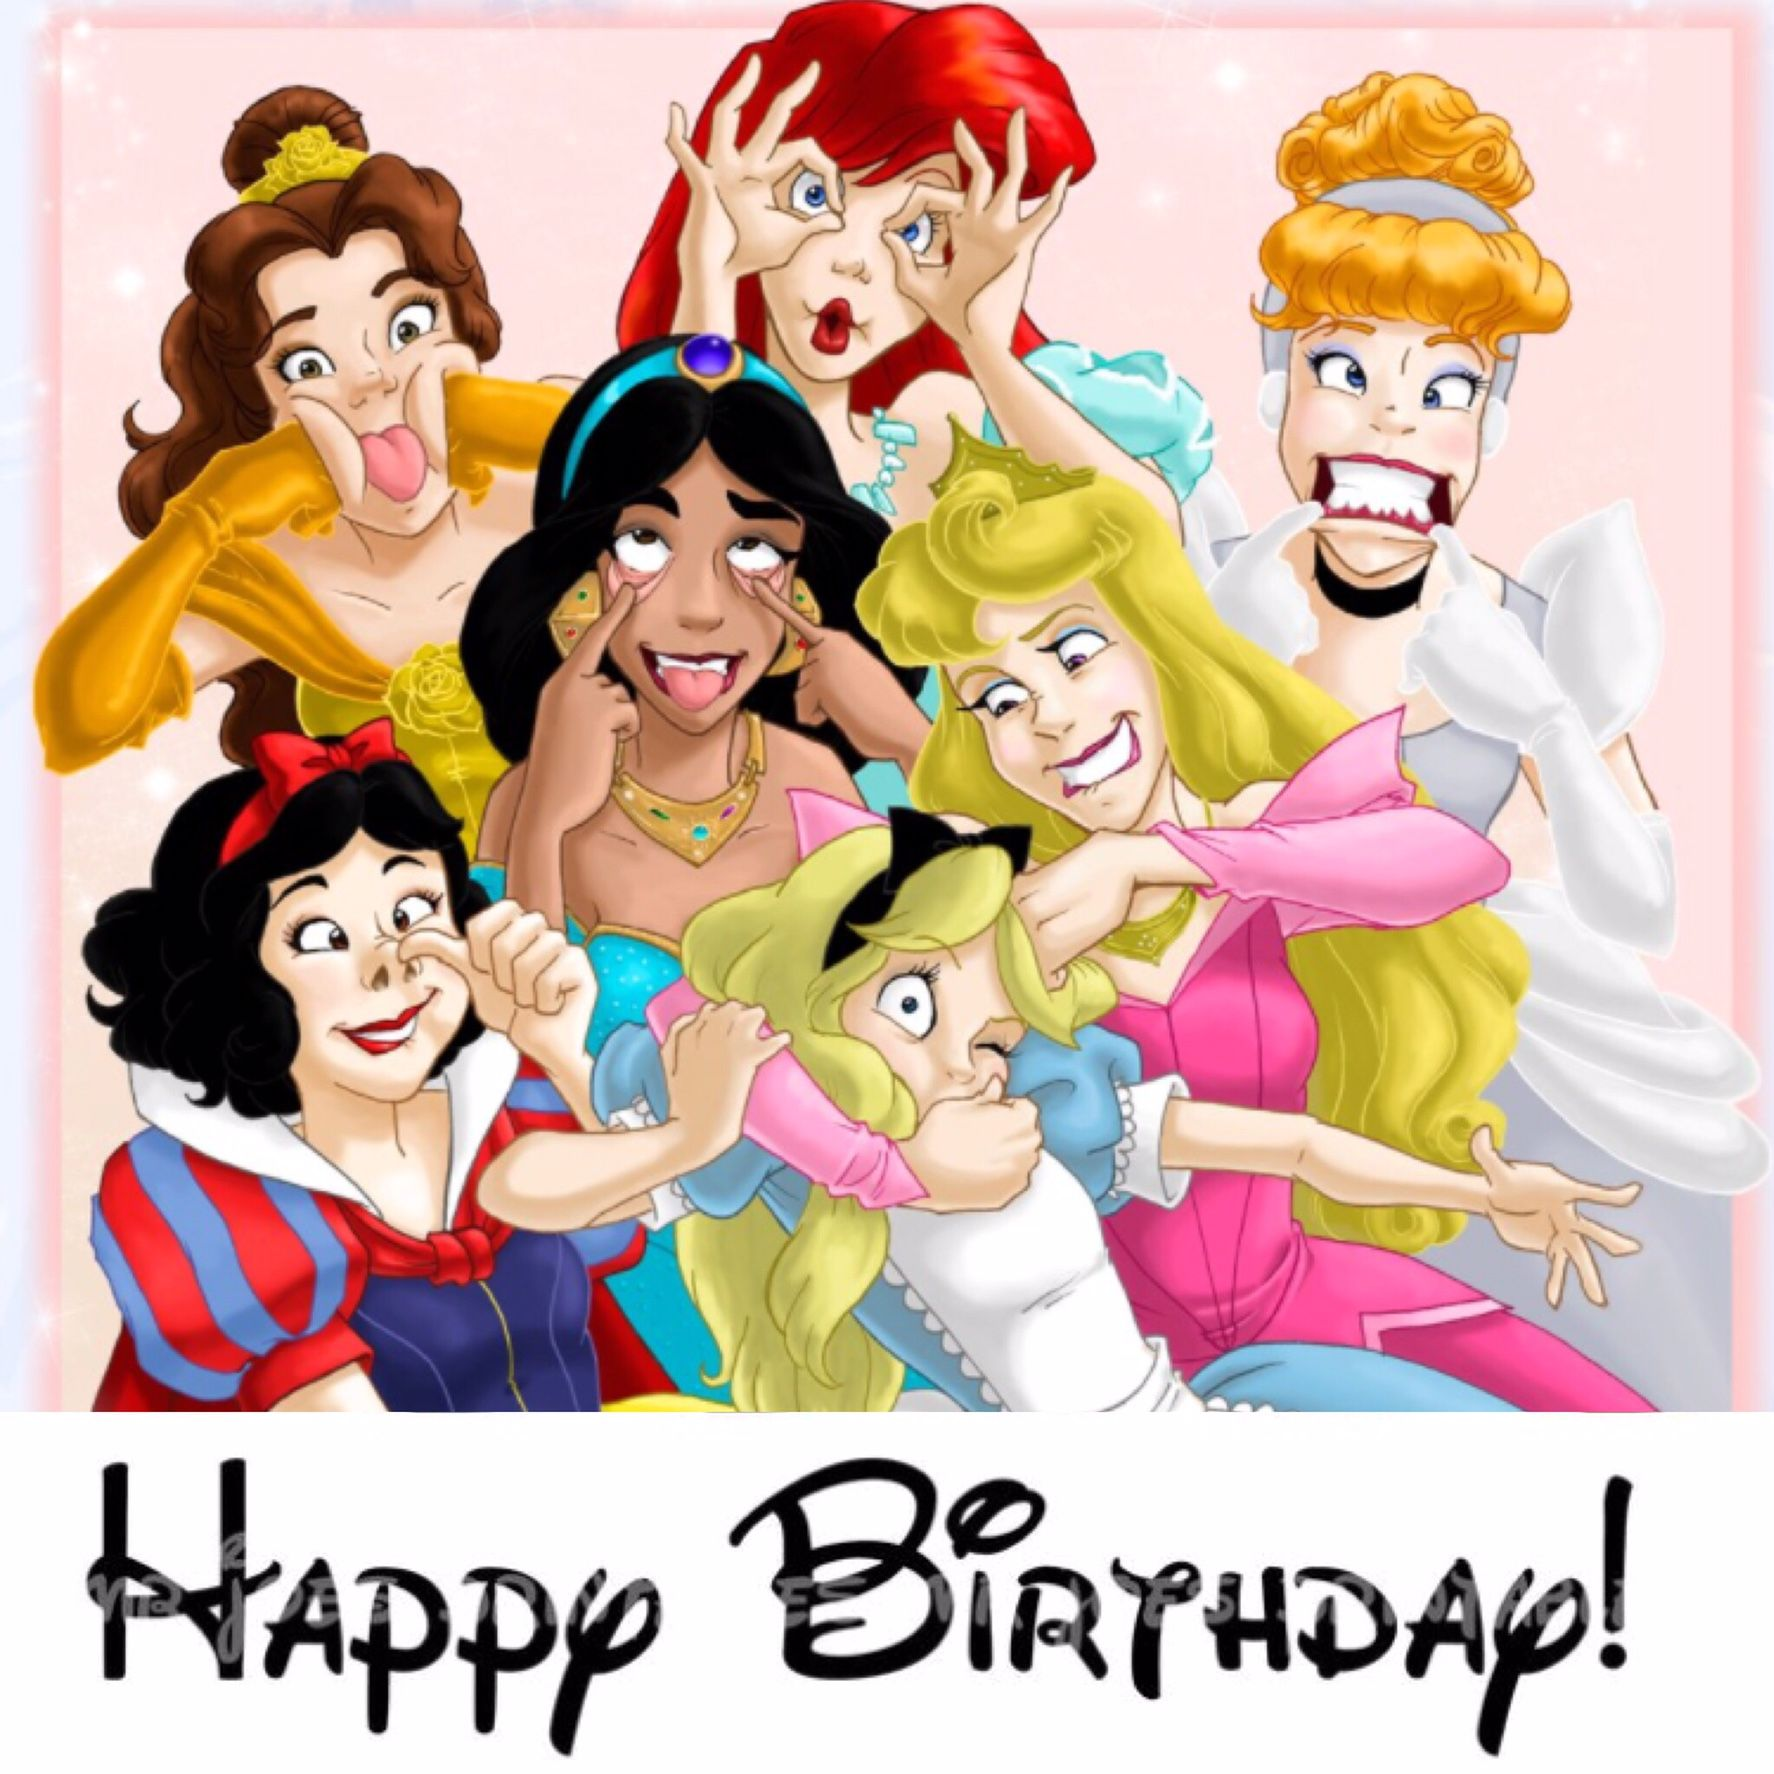 Disney Princess Birthday Meme Memes Pinterest Disney